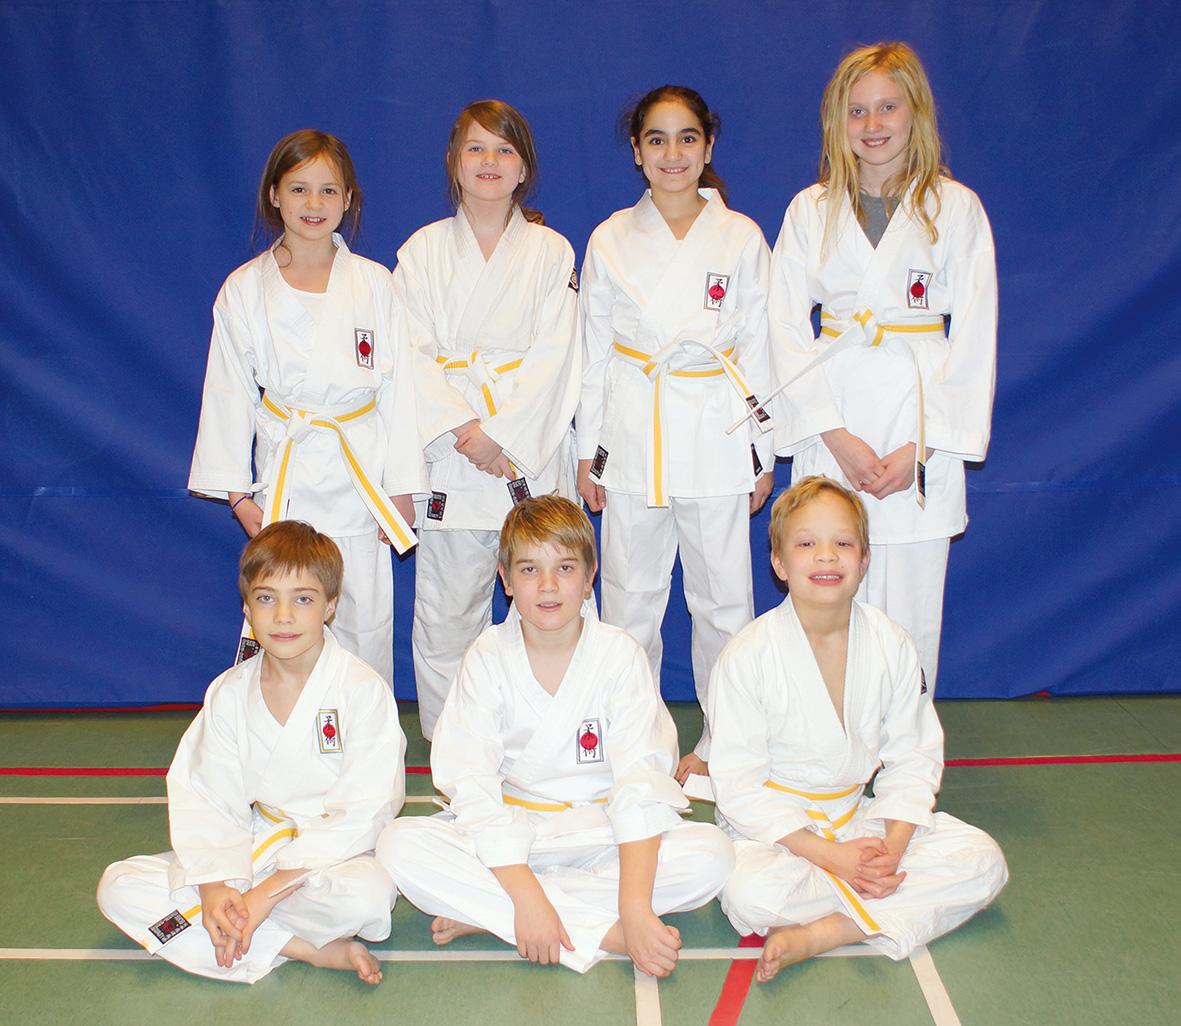 Gul-vitt bälte stående: Heidi Suatan, Petronella Nilsson, Emelie Aydin, Elin Edlund. Sittande: Rasmus Blomgren, Rasmus Nielsen, Leo Sellei